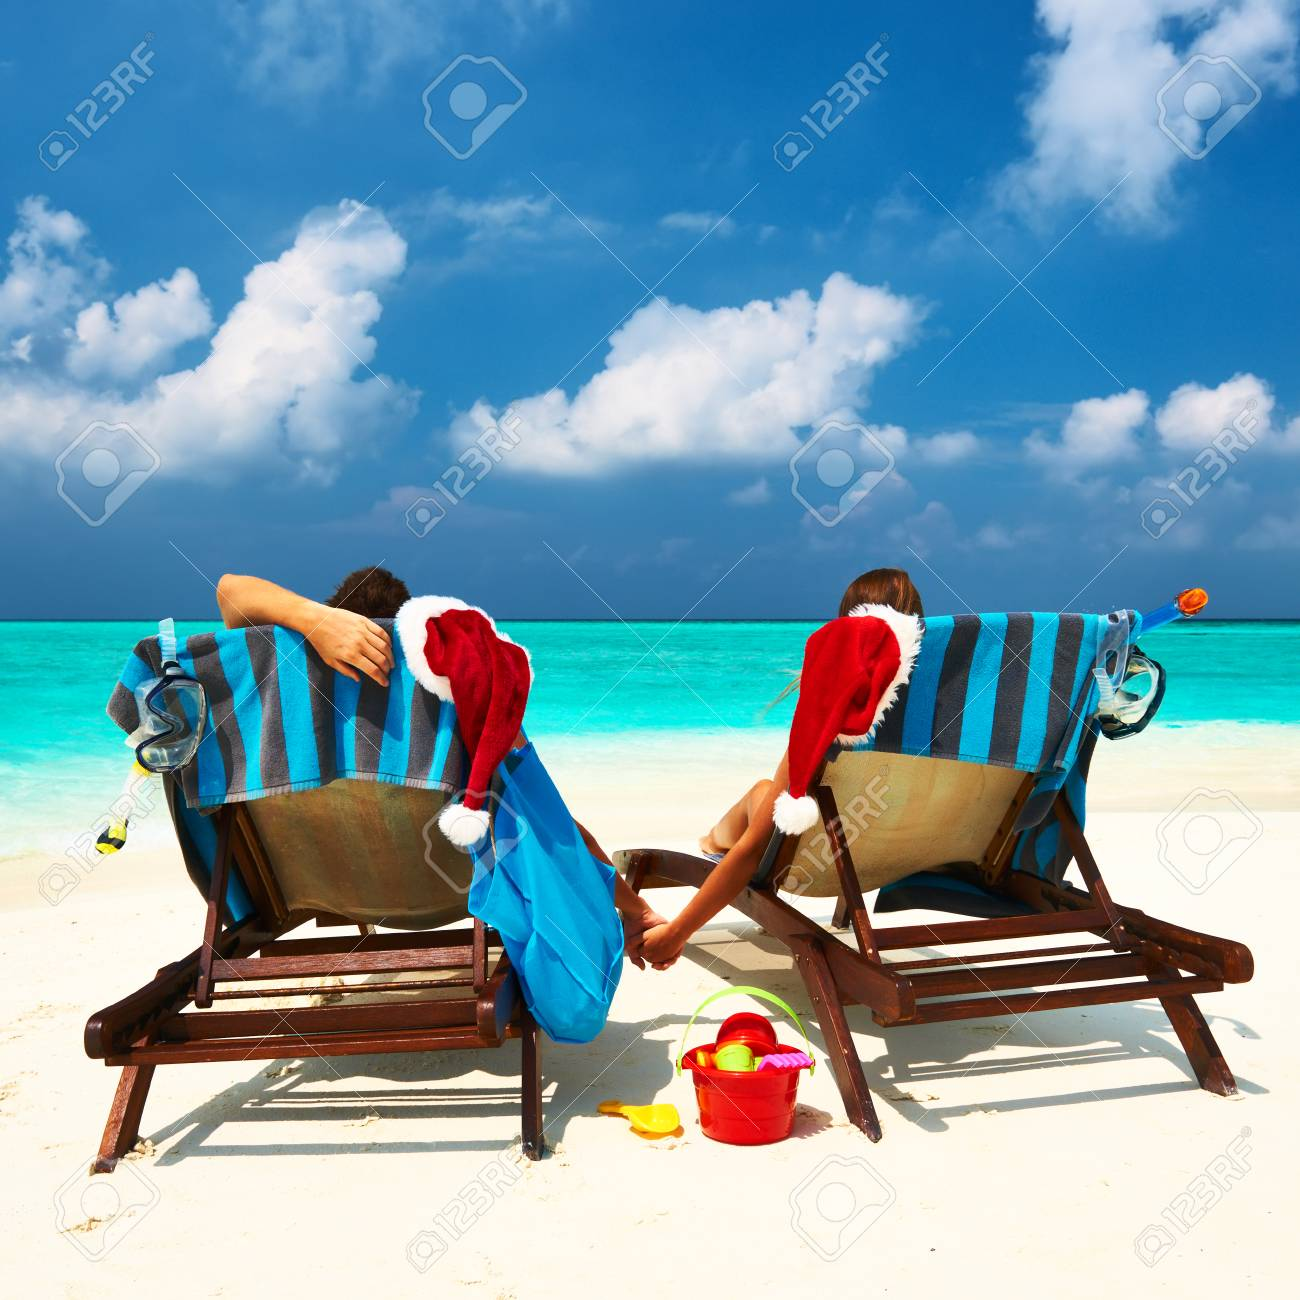 Couple on a tropical beach at Maldives Stock Photo - 22534261